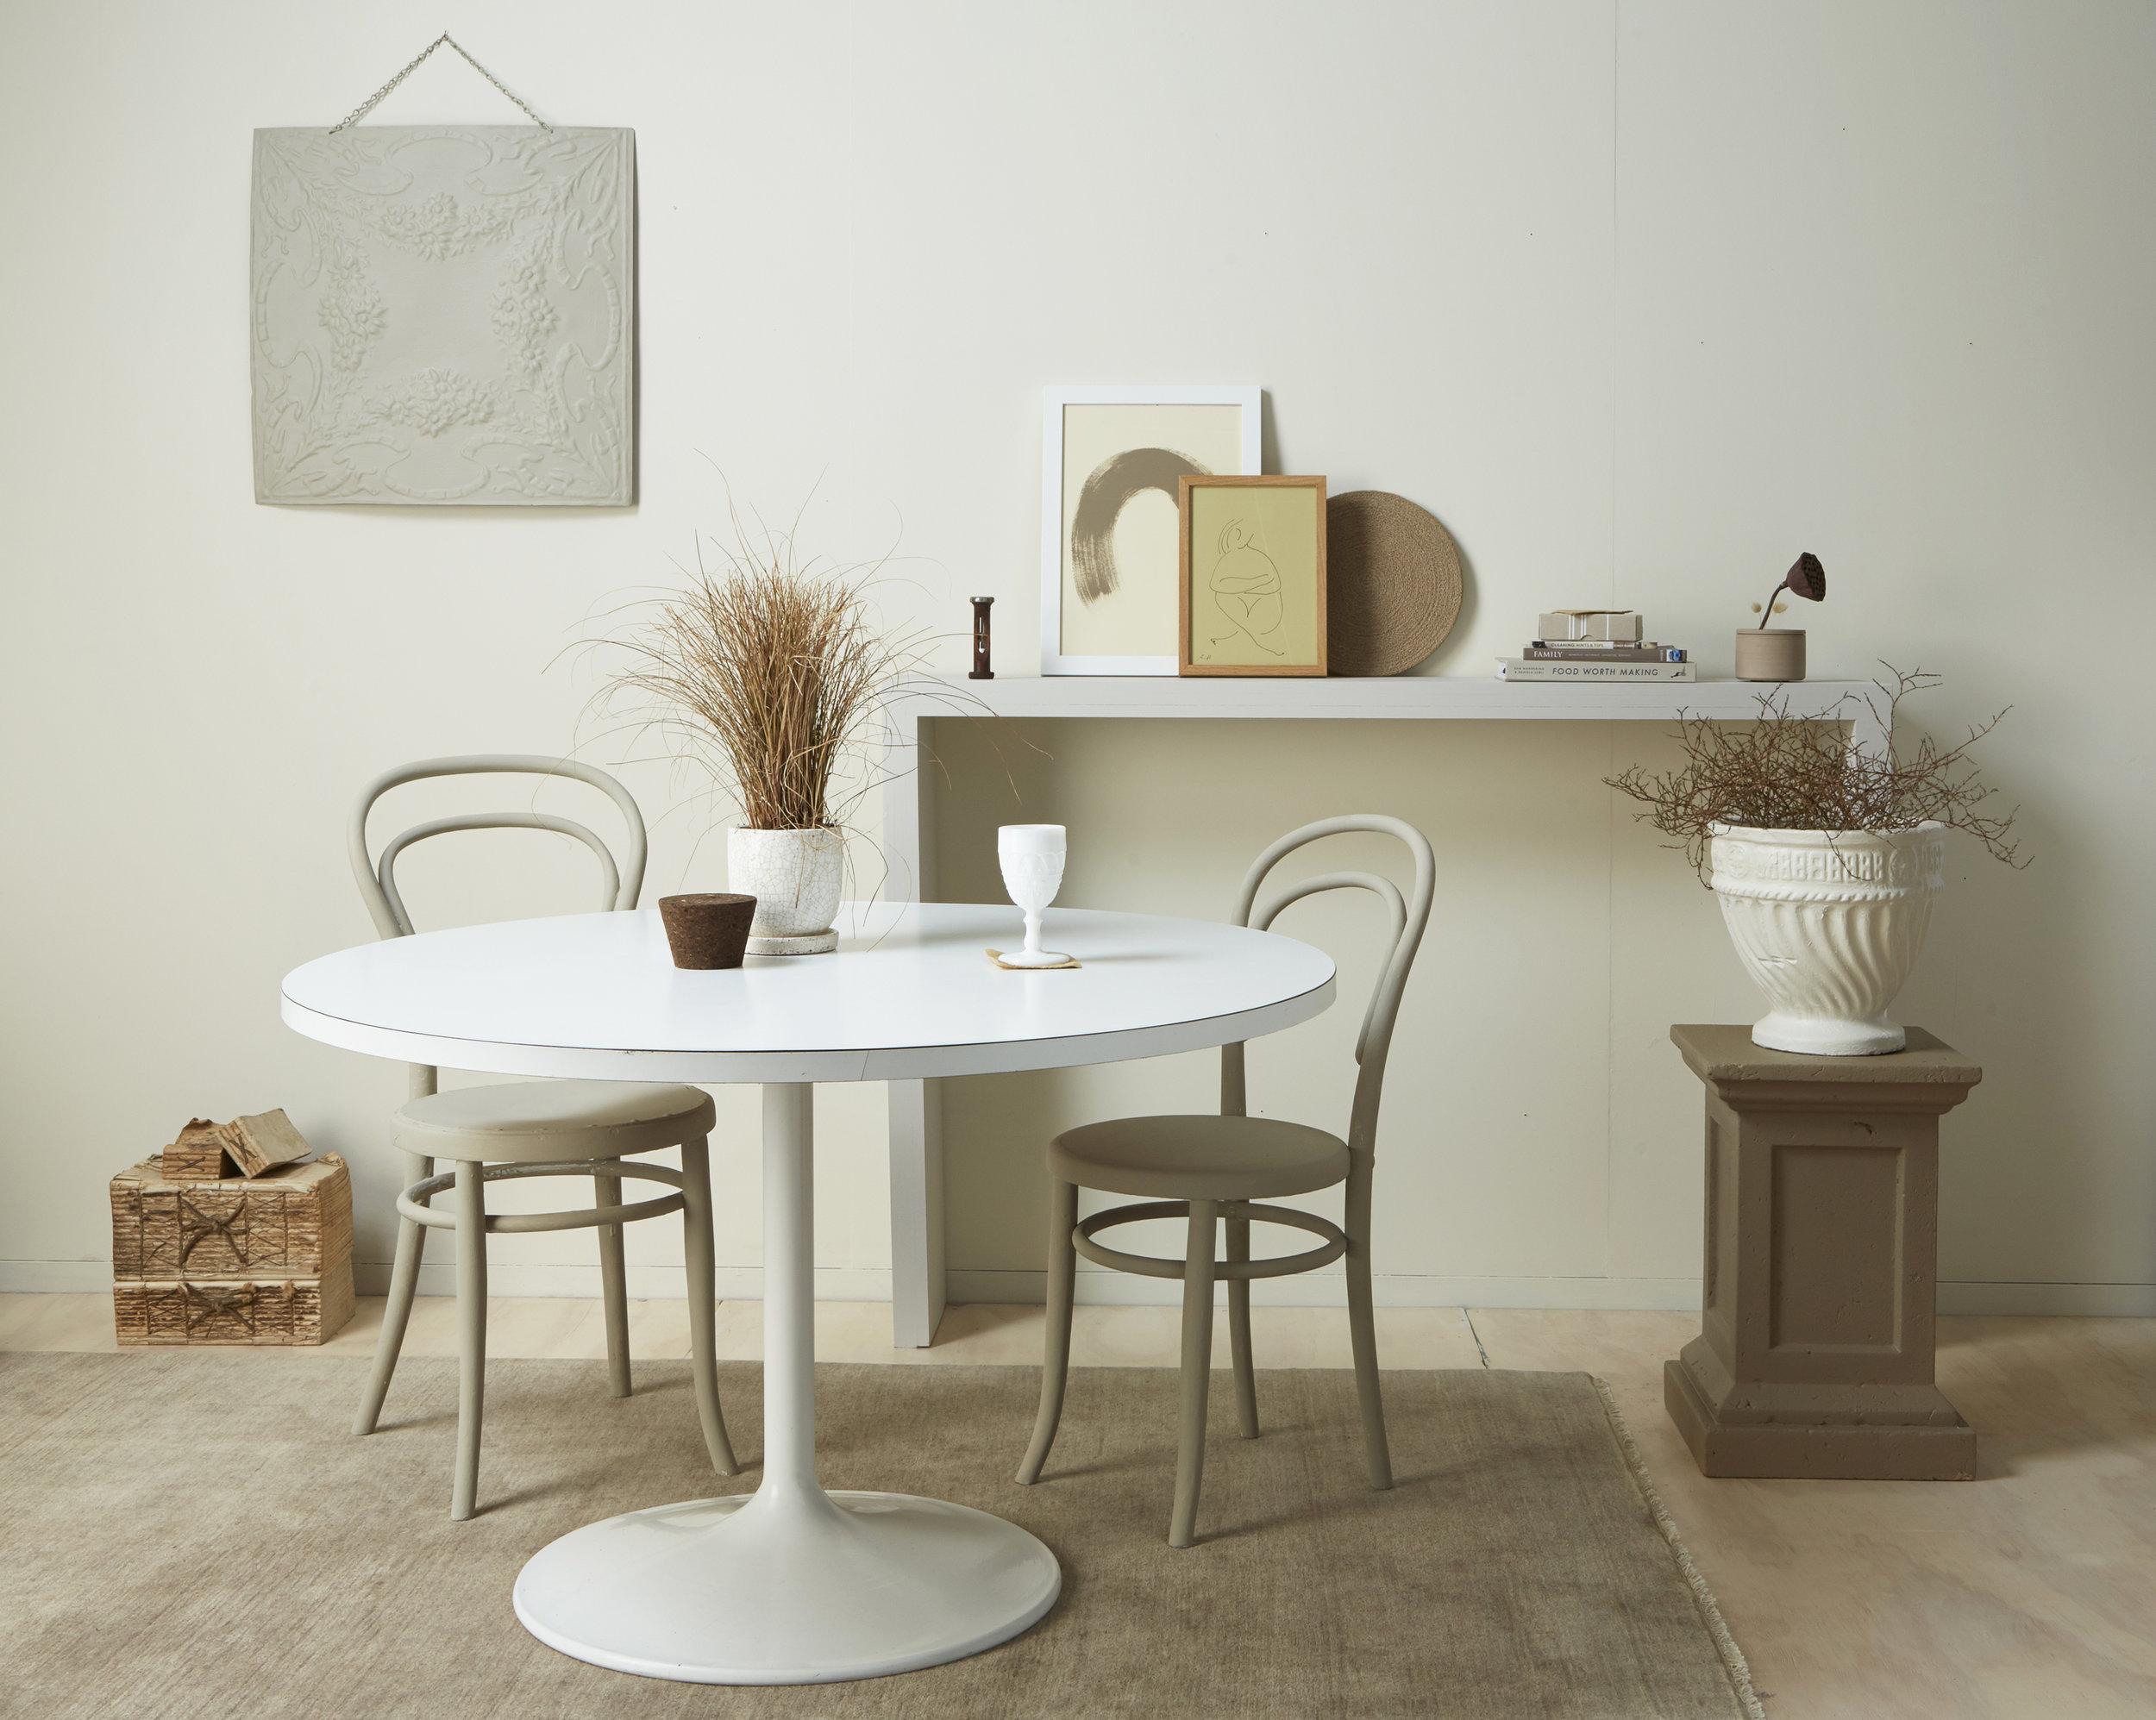 Kate Alexander,dining,Resene Spanish White+Whitewash+Napa+Artisan+Egth Stonewashed,photo Bryce Carleton3.jpg